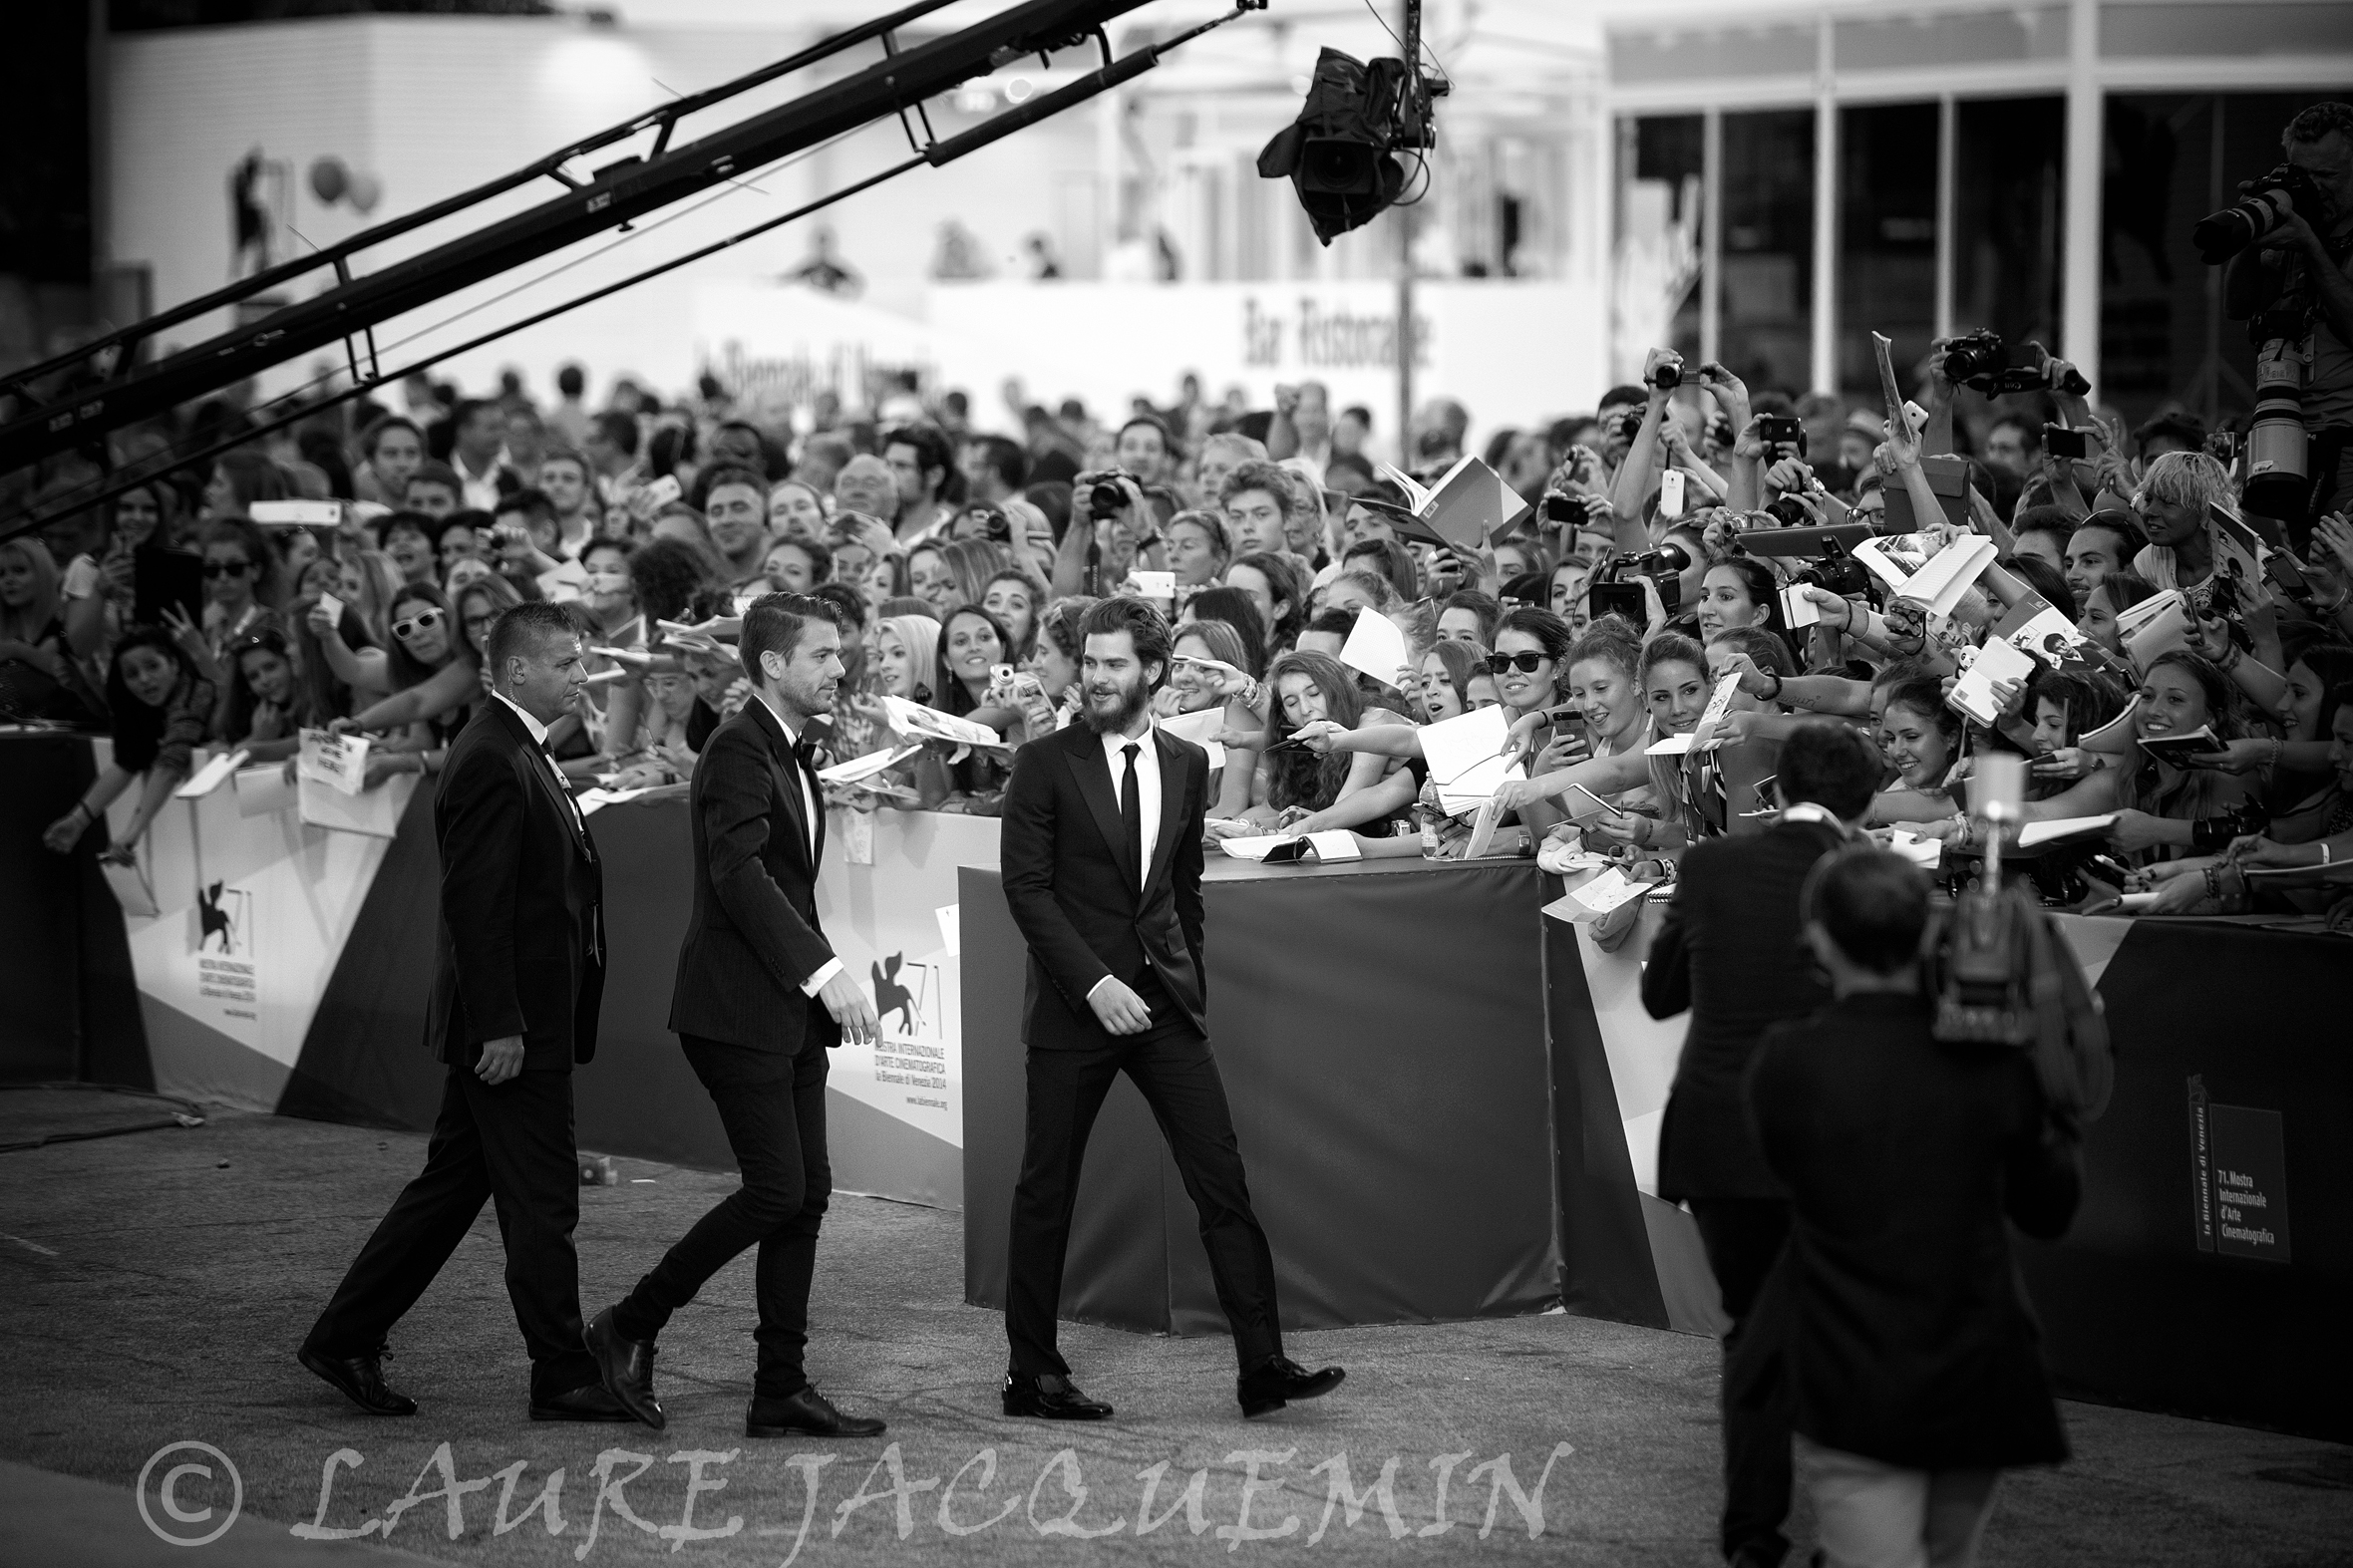 venice film festival venice laure jacquemin (14).jpg